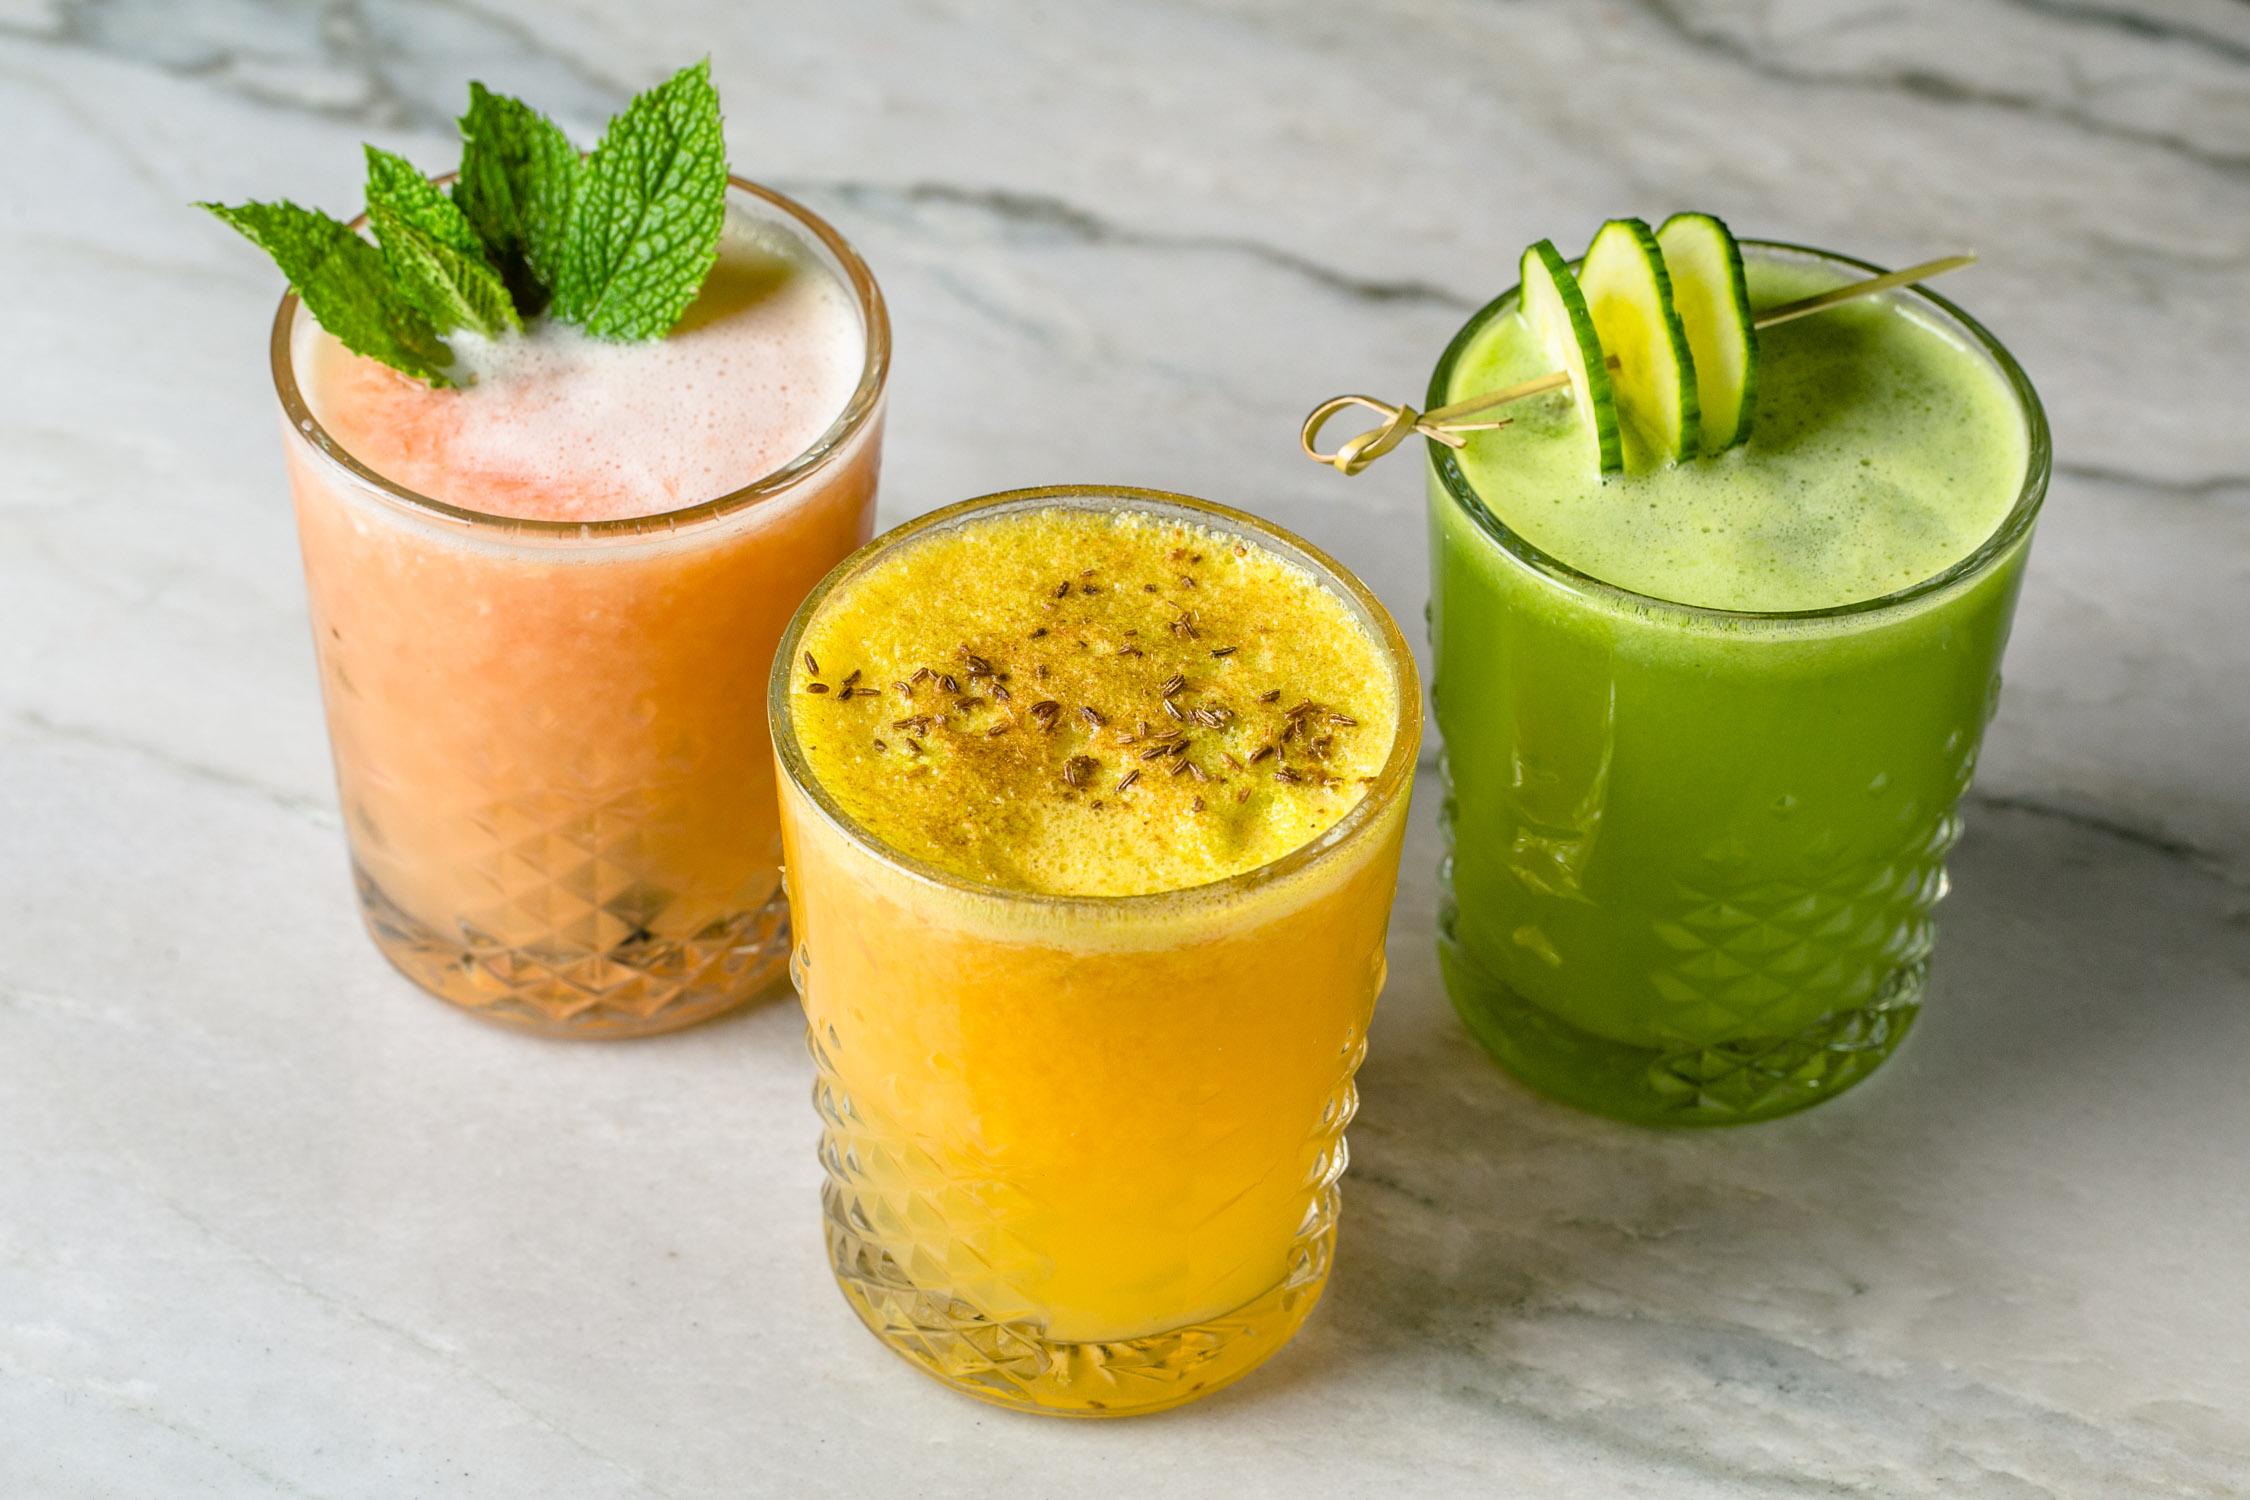 Omni-Hotel-at-The-Battery-Atlanta-Suntrust-Park-Fresh-Juices-Erik-Meadows